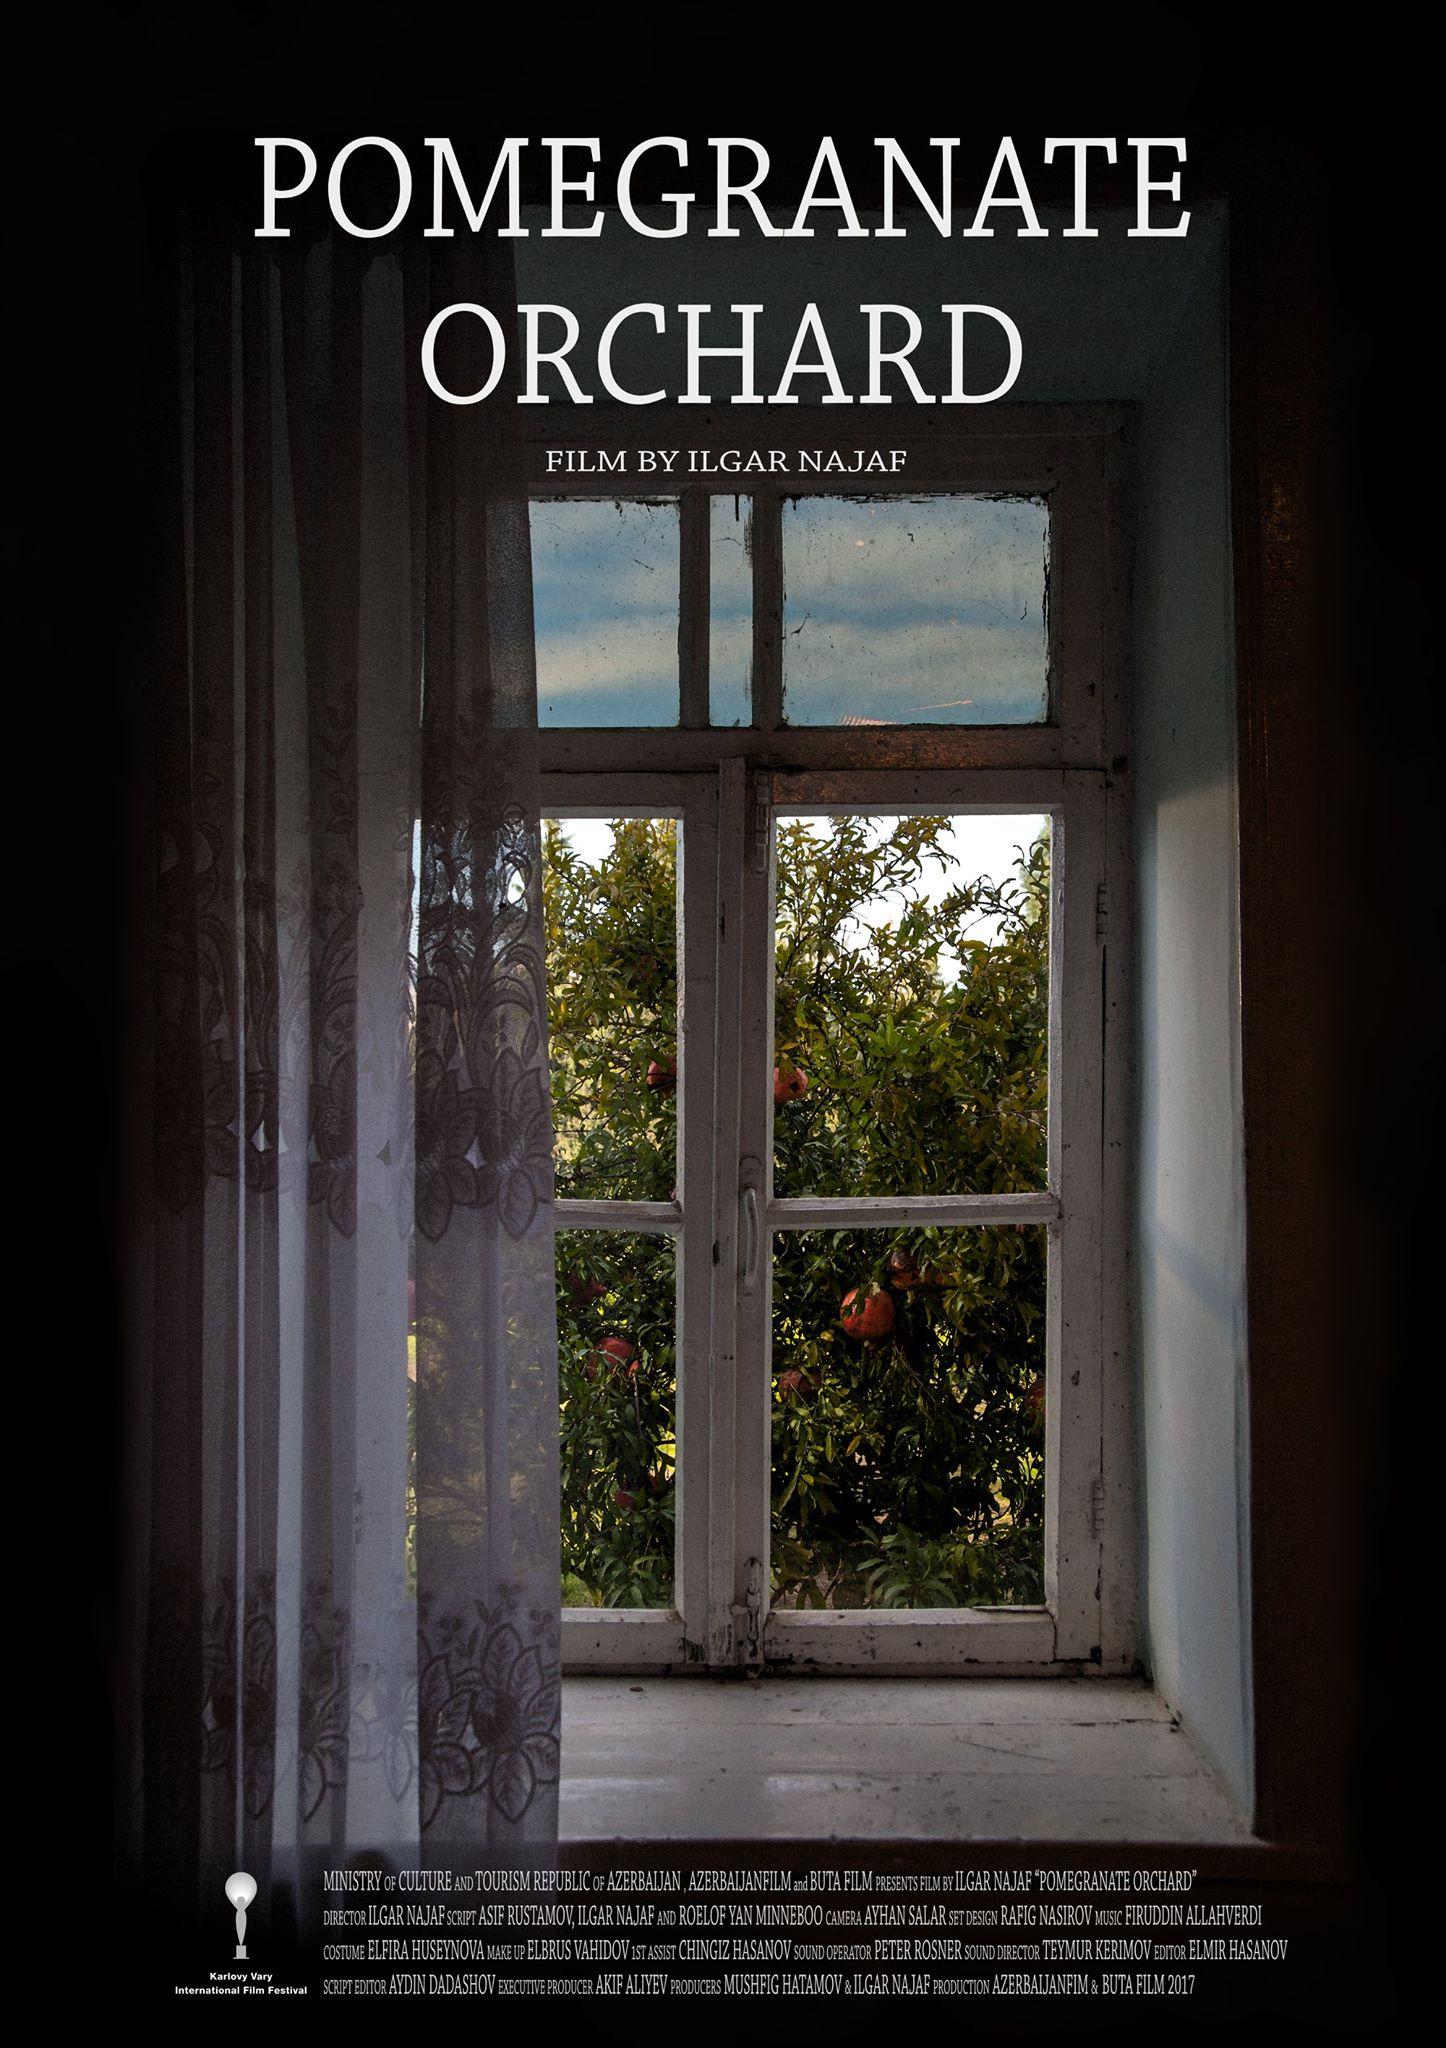 Pomgranade Orchard